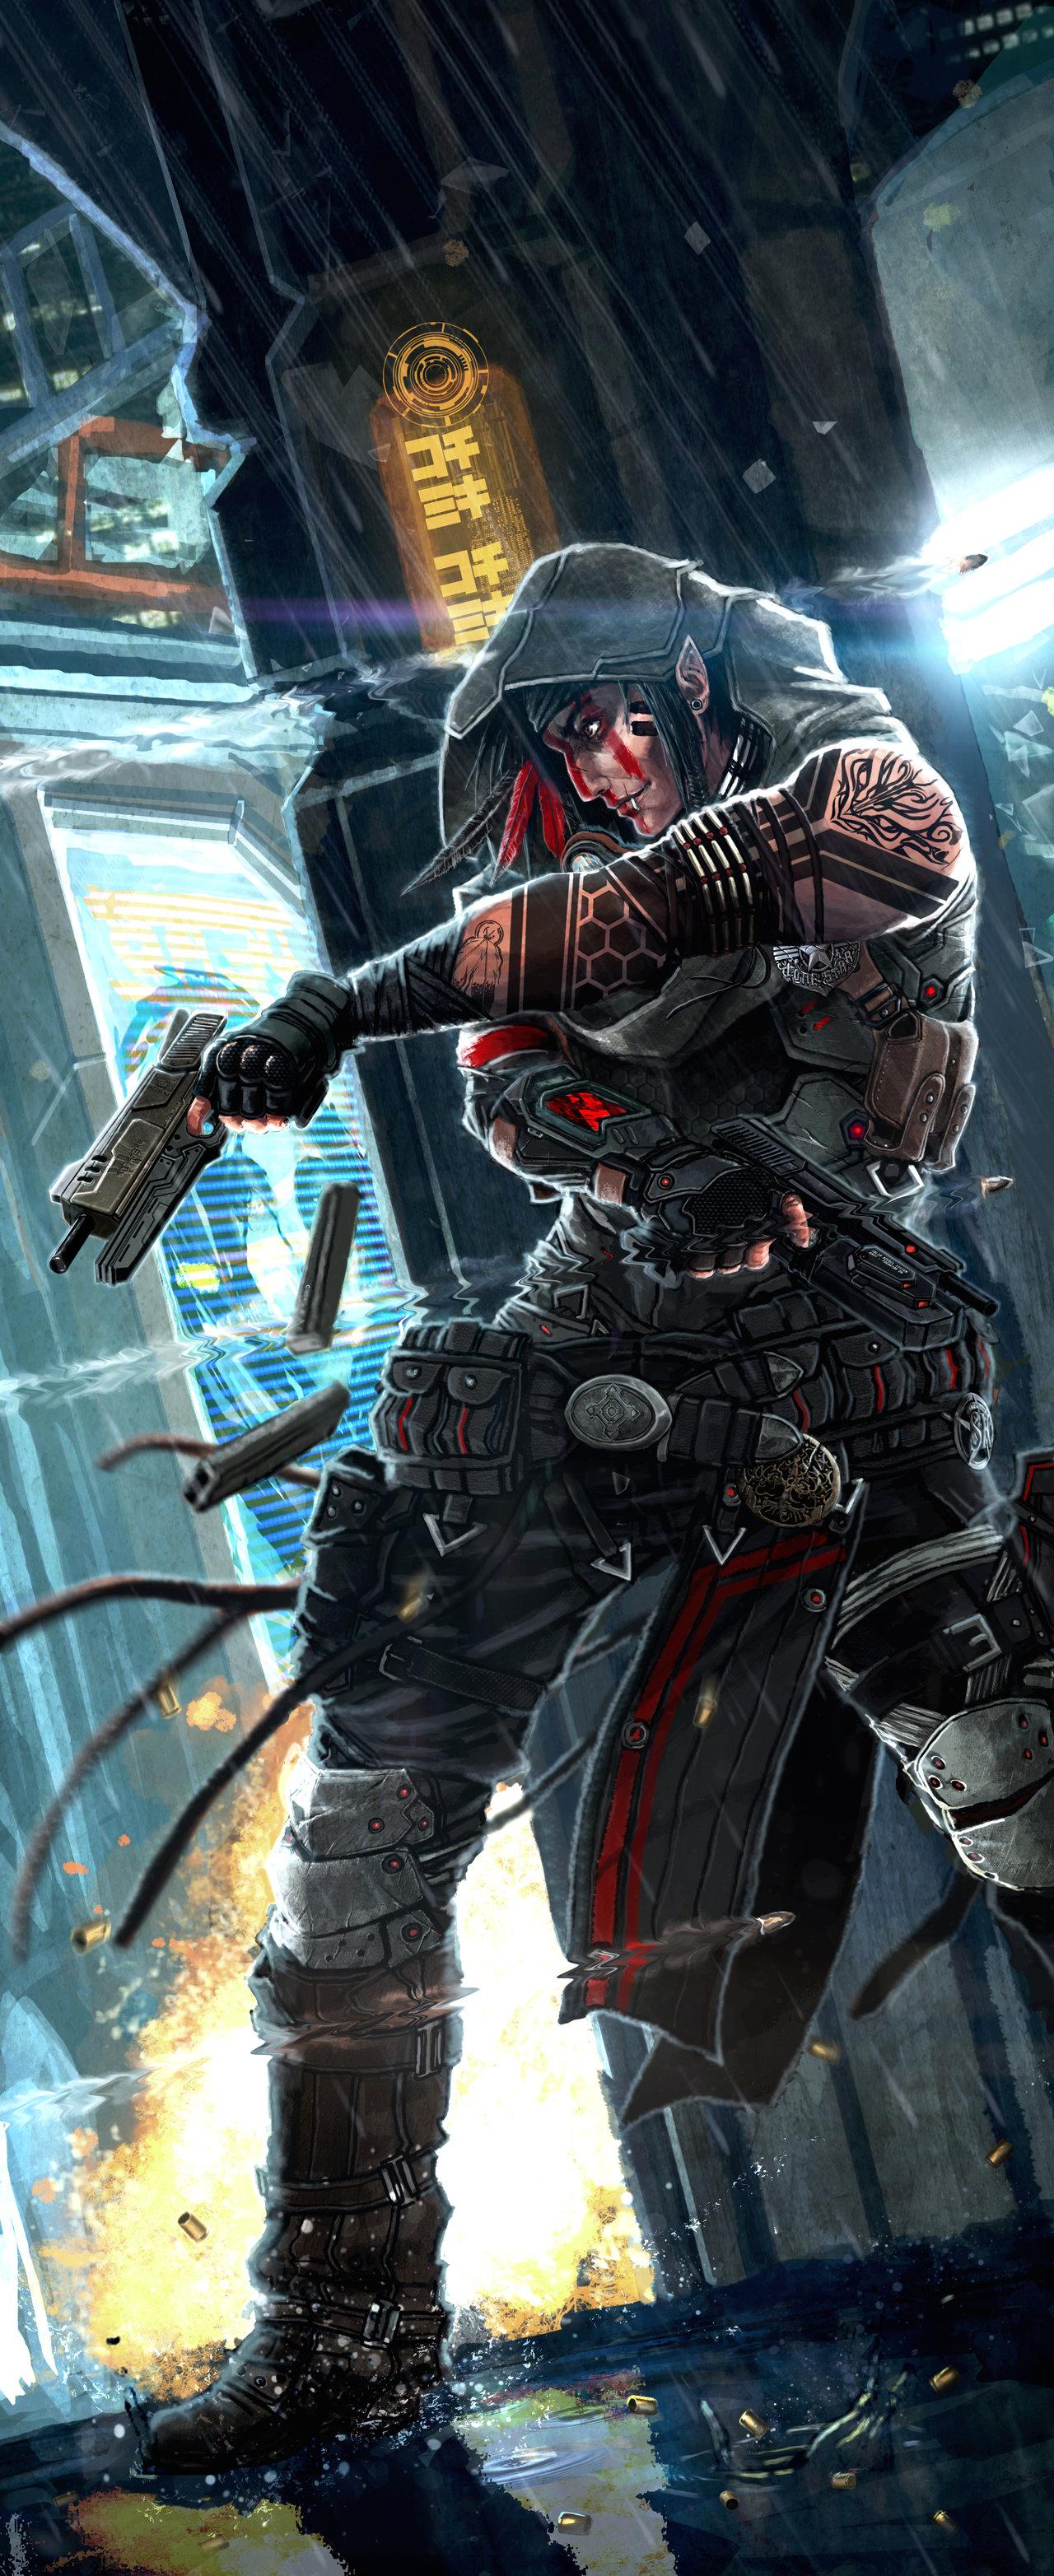 gunslinger_adept_by_django_red-d6e9pid.jpg